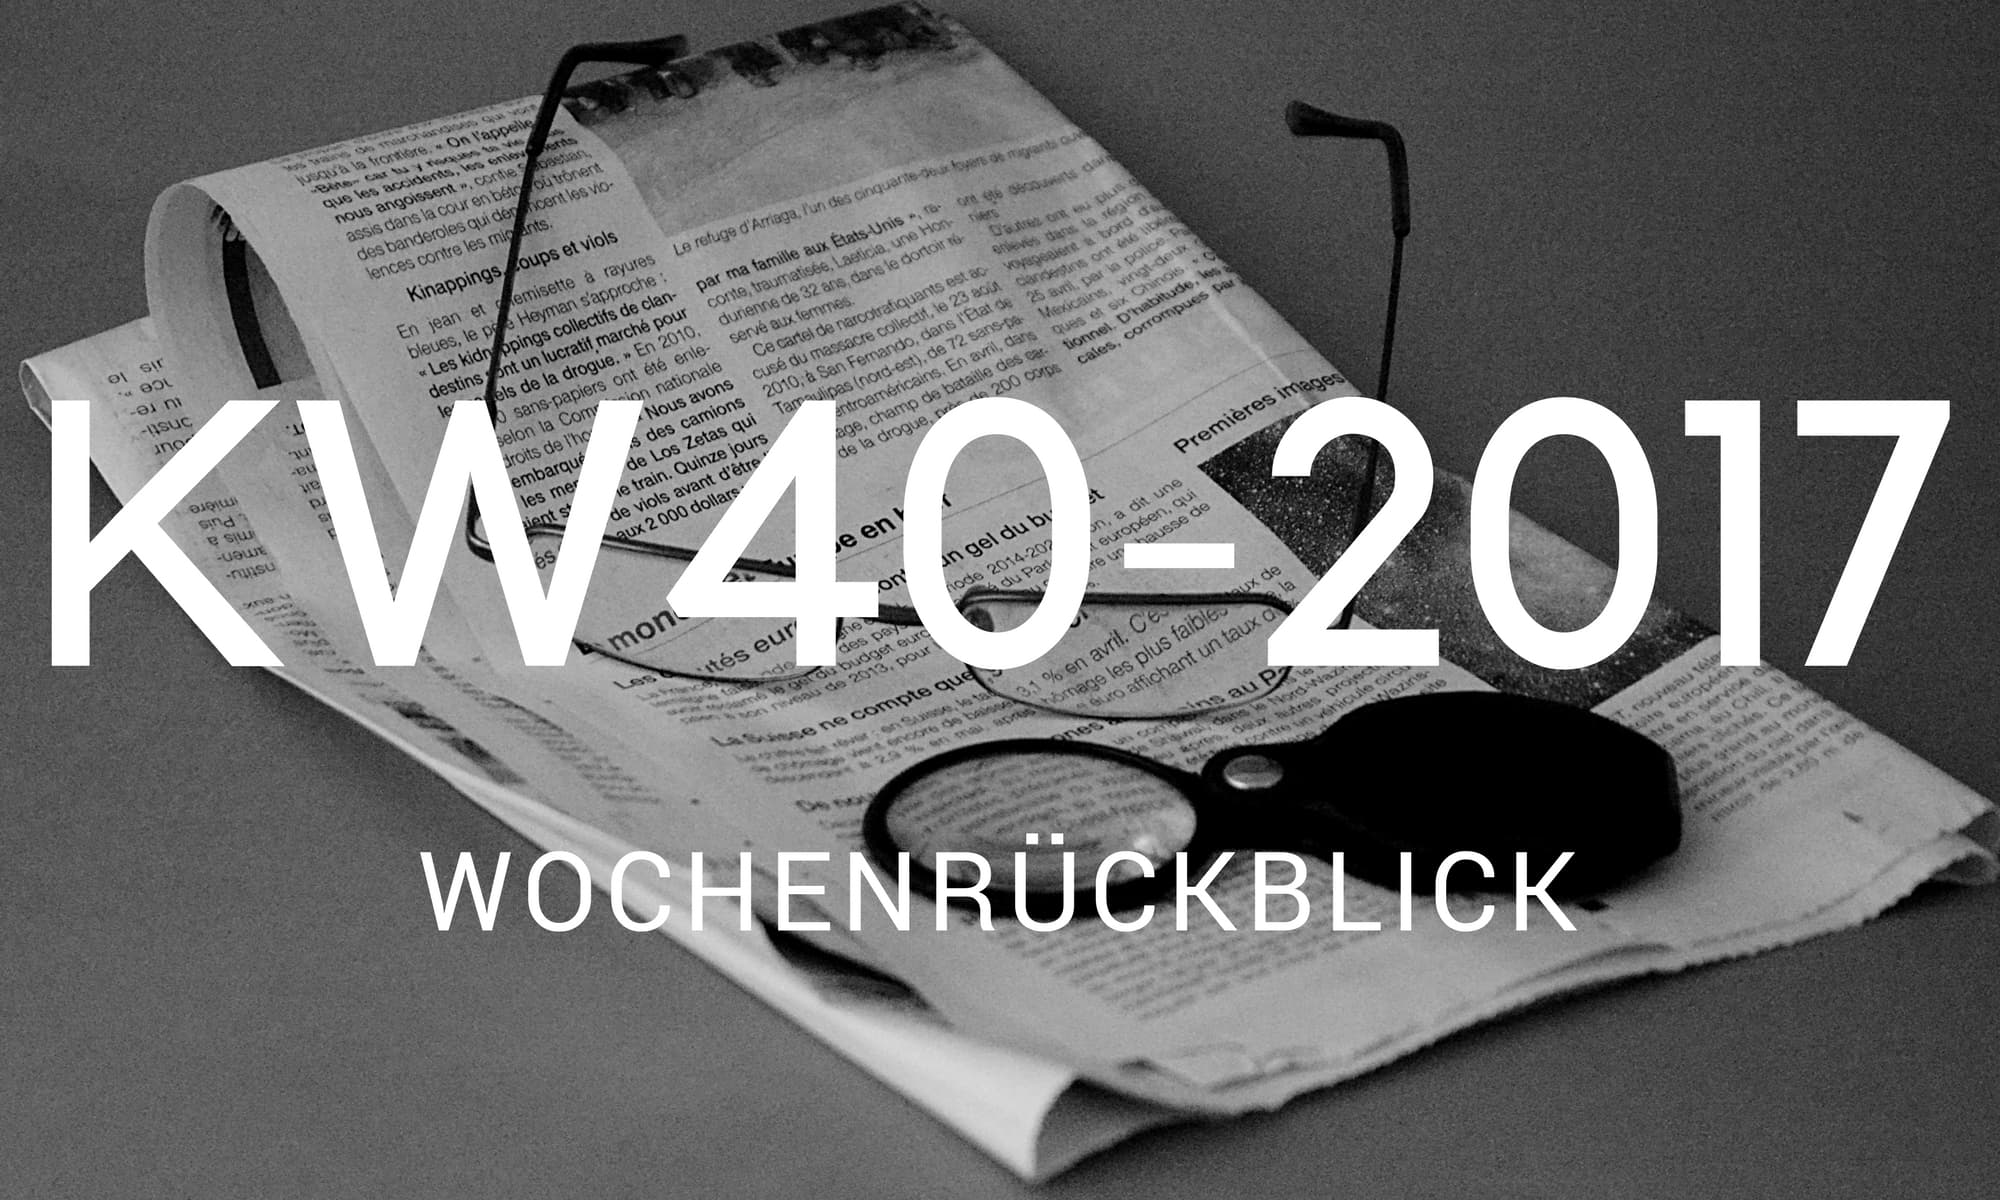 wochenrueckblick camping news KW40 2017